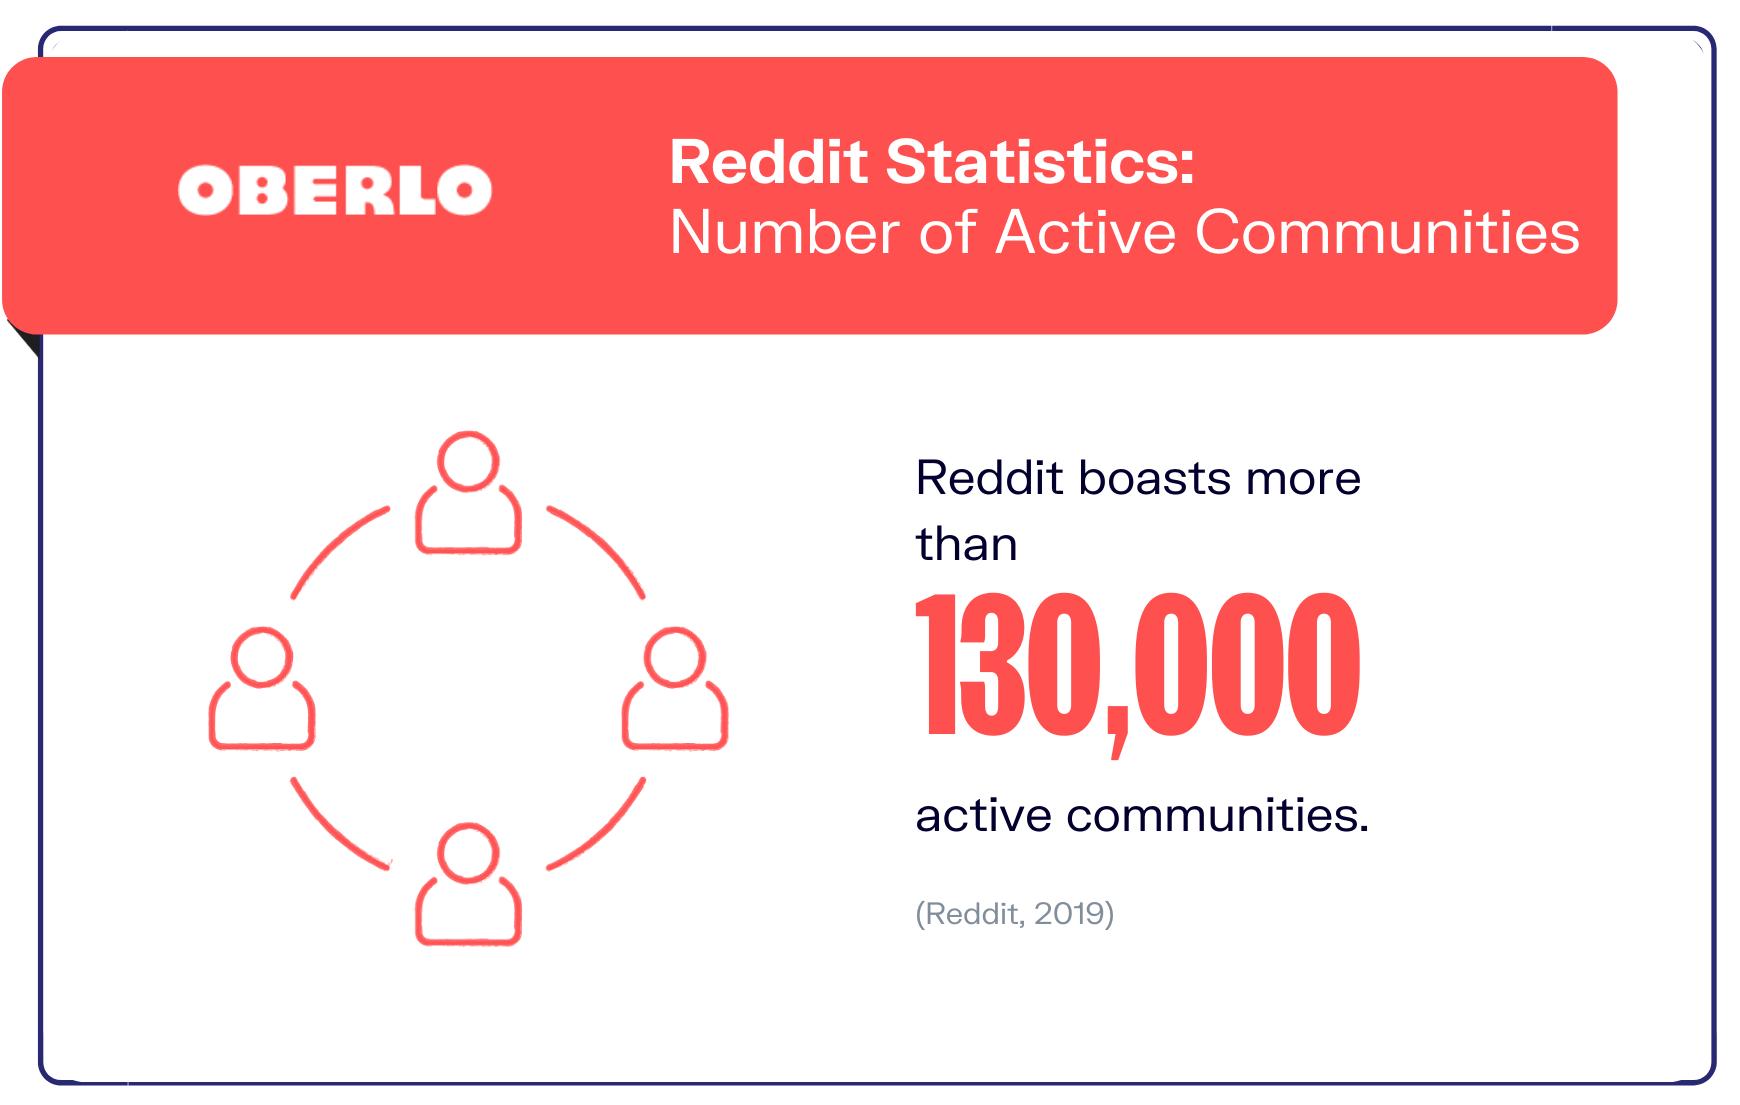 graphic of reddit statistic #7